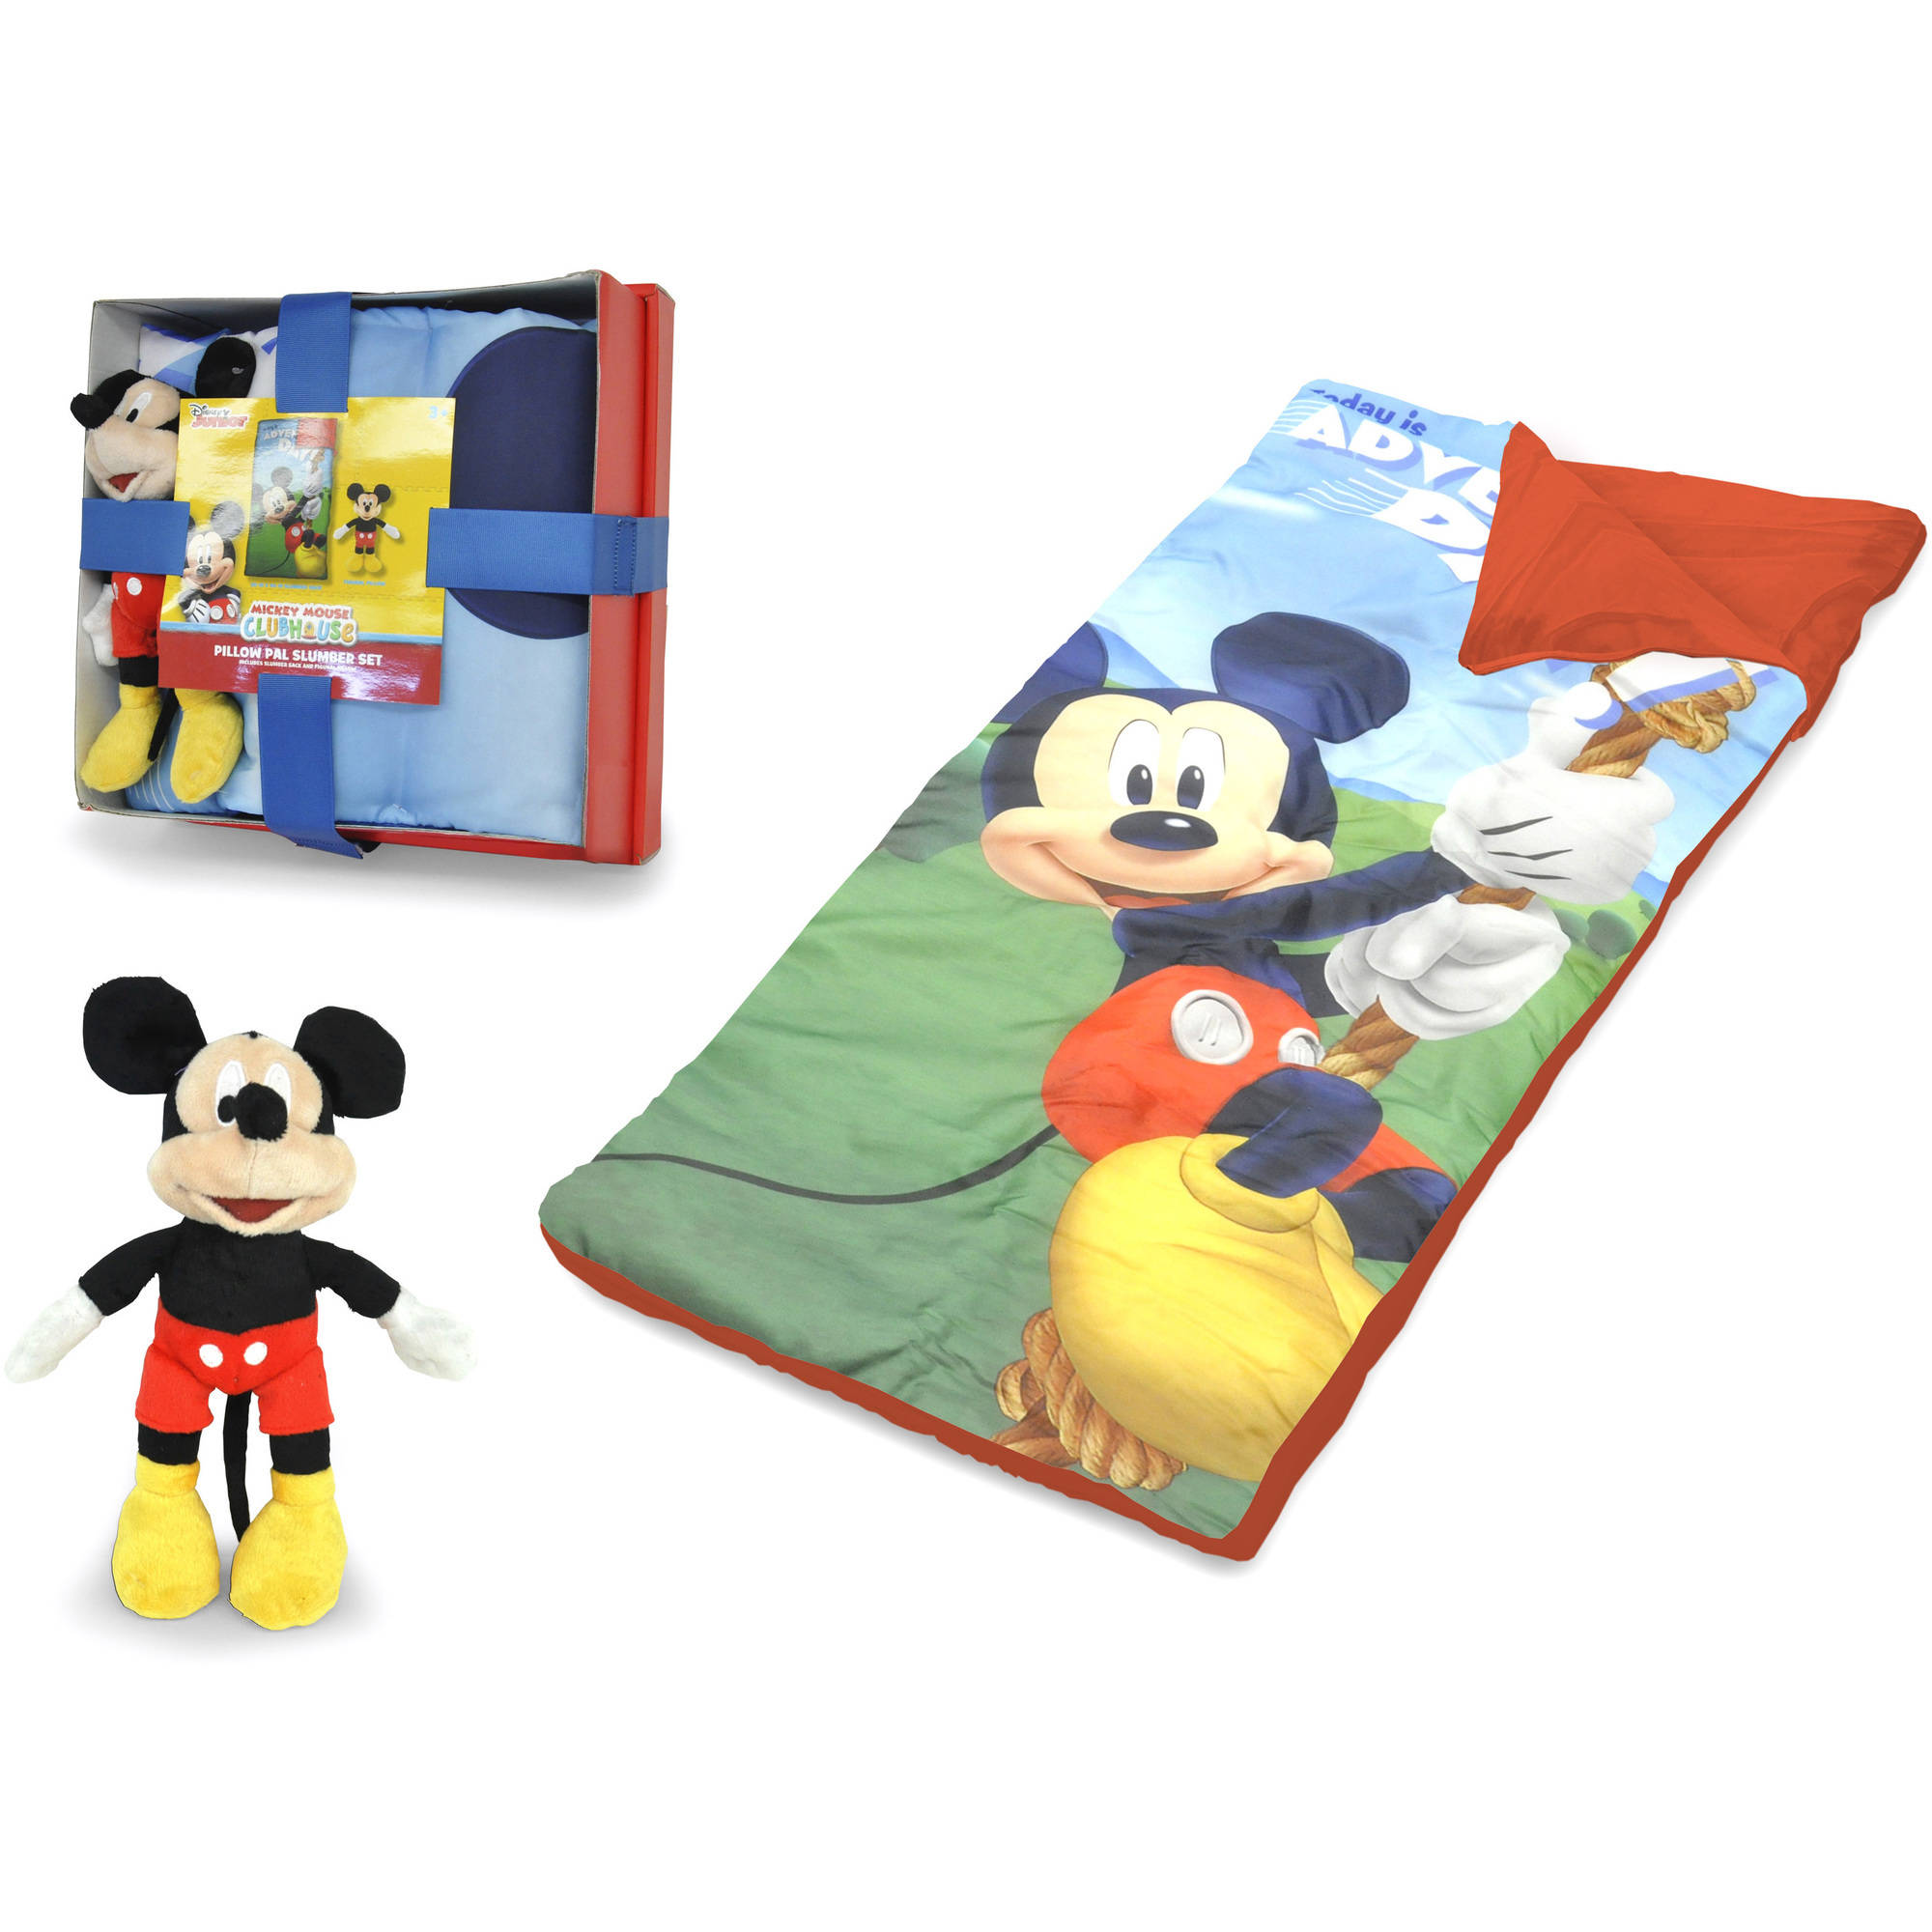 Disney Mickey Mouse Nap Mat With Bonus Figural Pillow